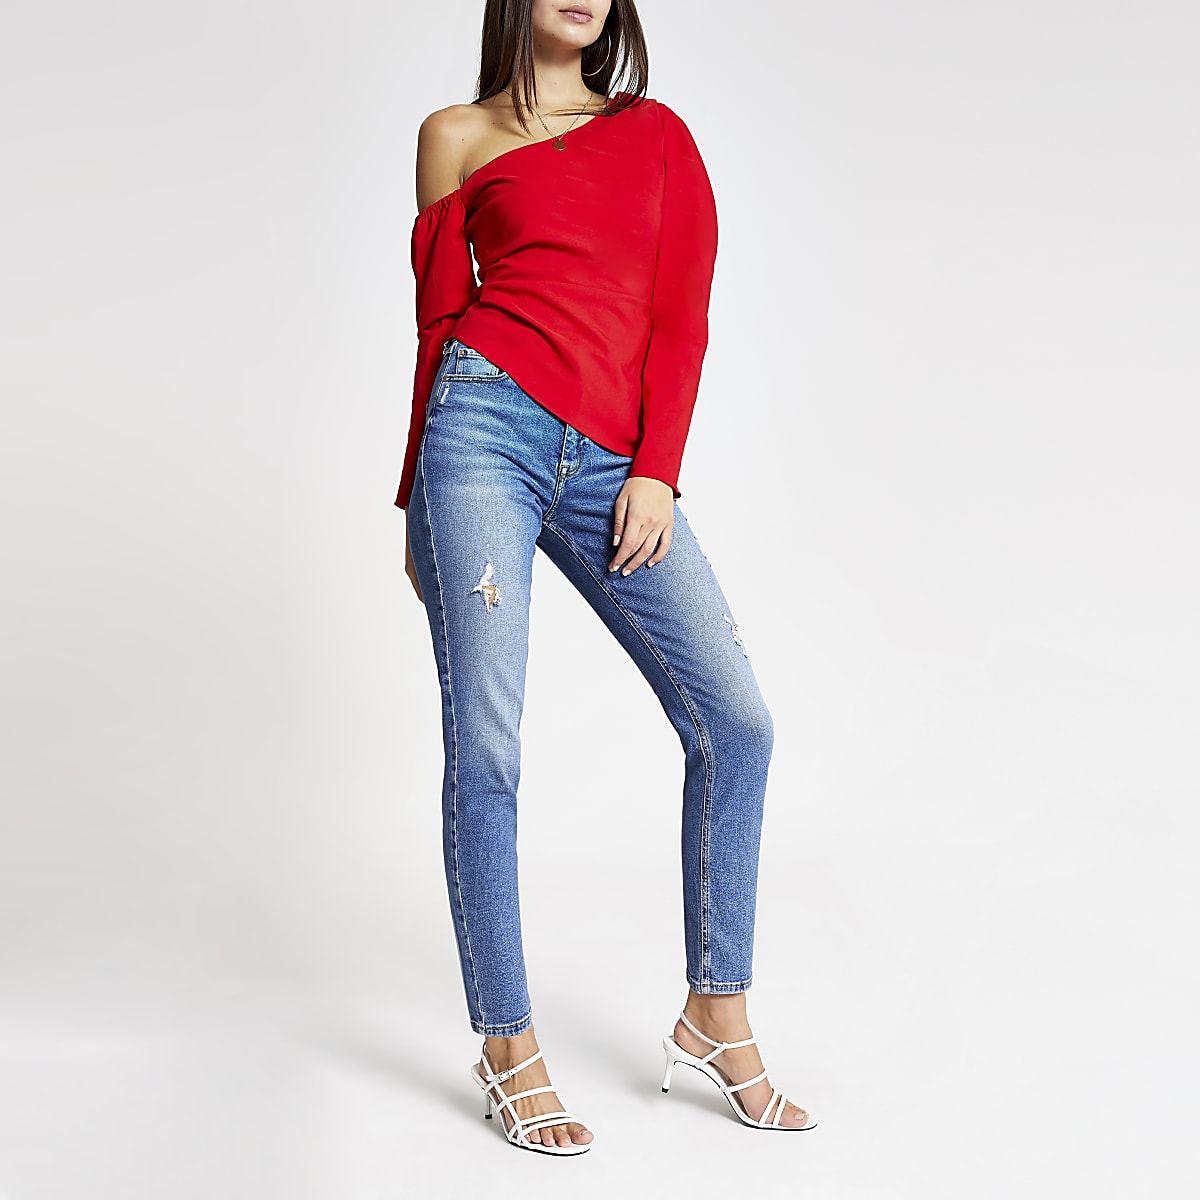 Rode asymmetrische schouderloze bardot top